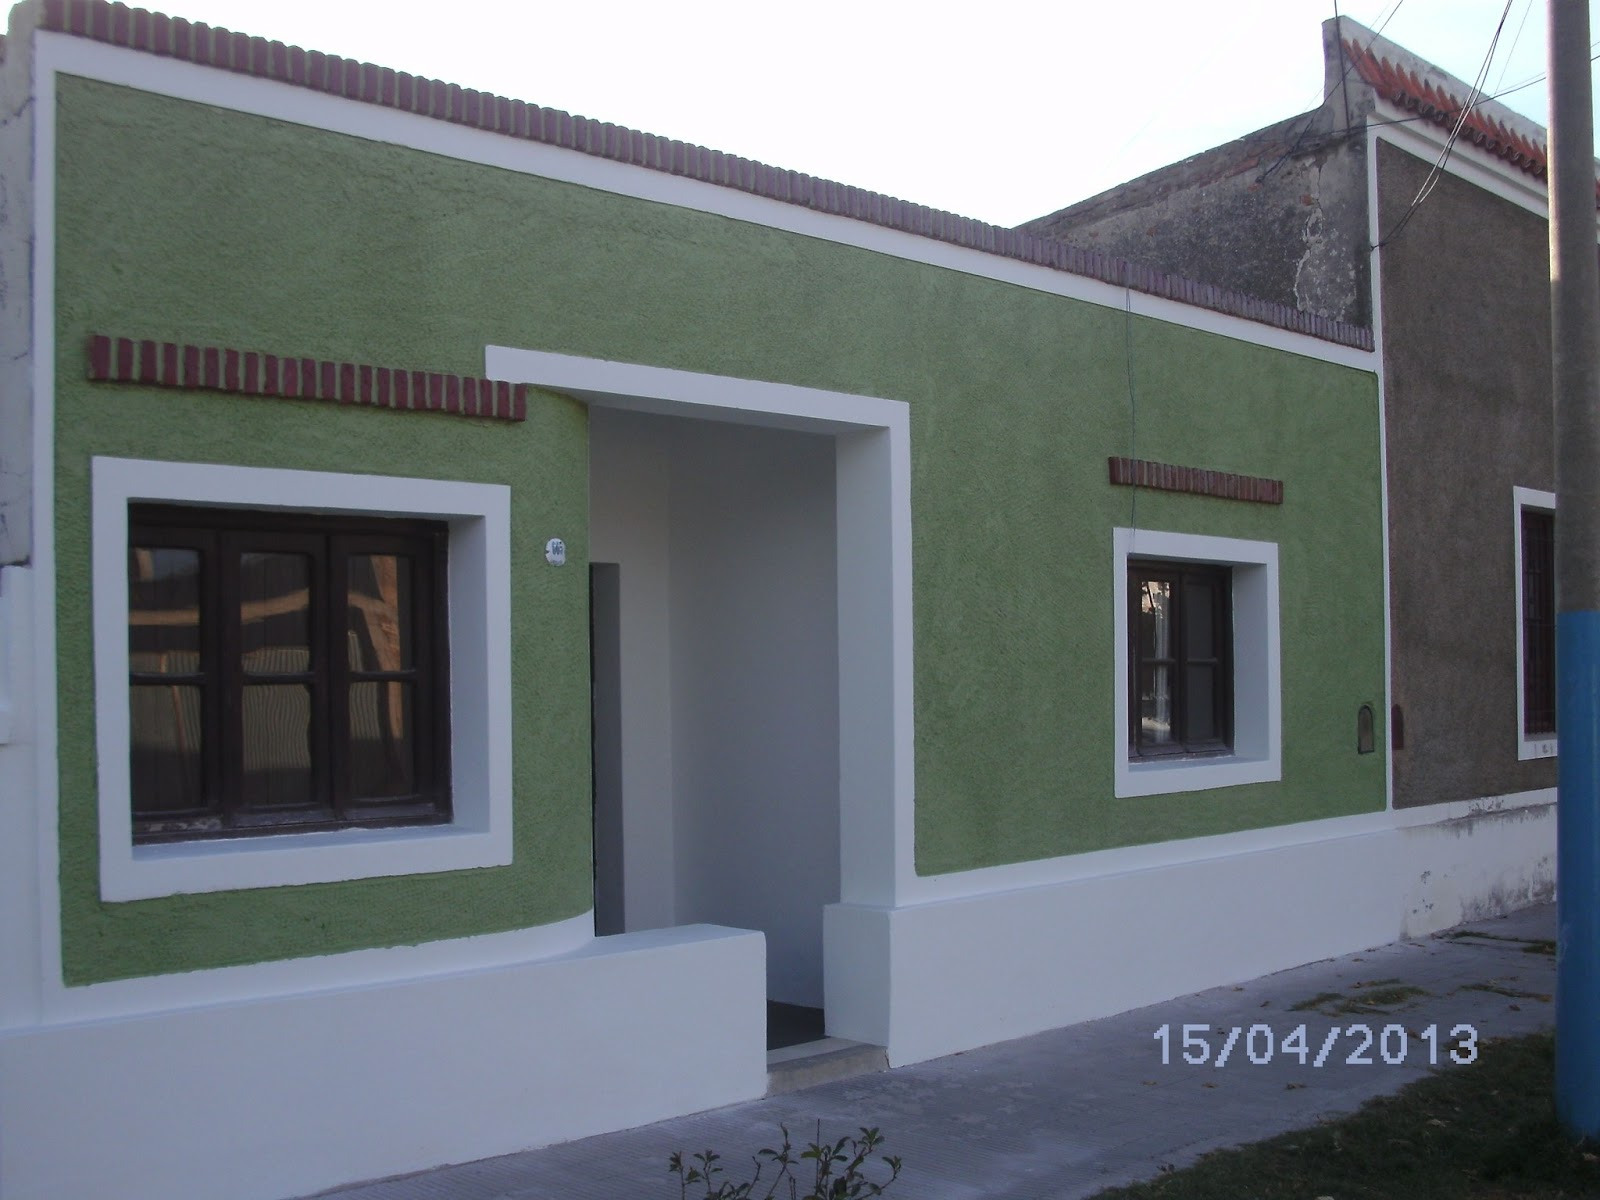 Restauraciones pinturas cartelerias pintura frente de for Colores para pintar frentes de casas